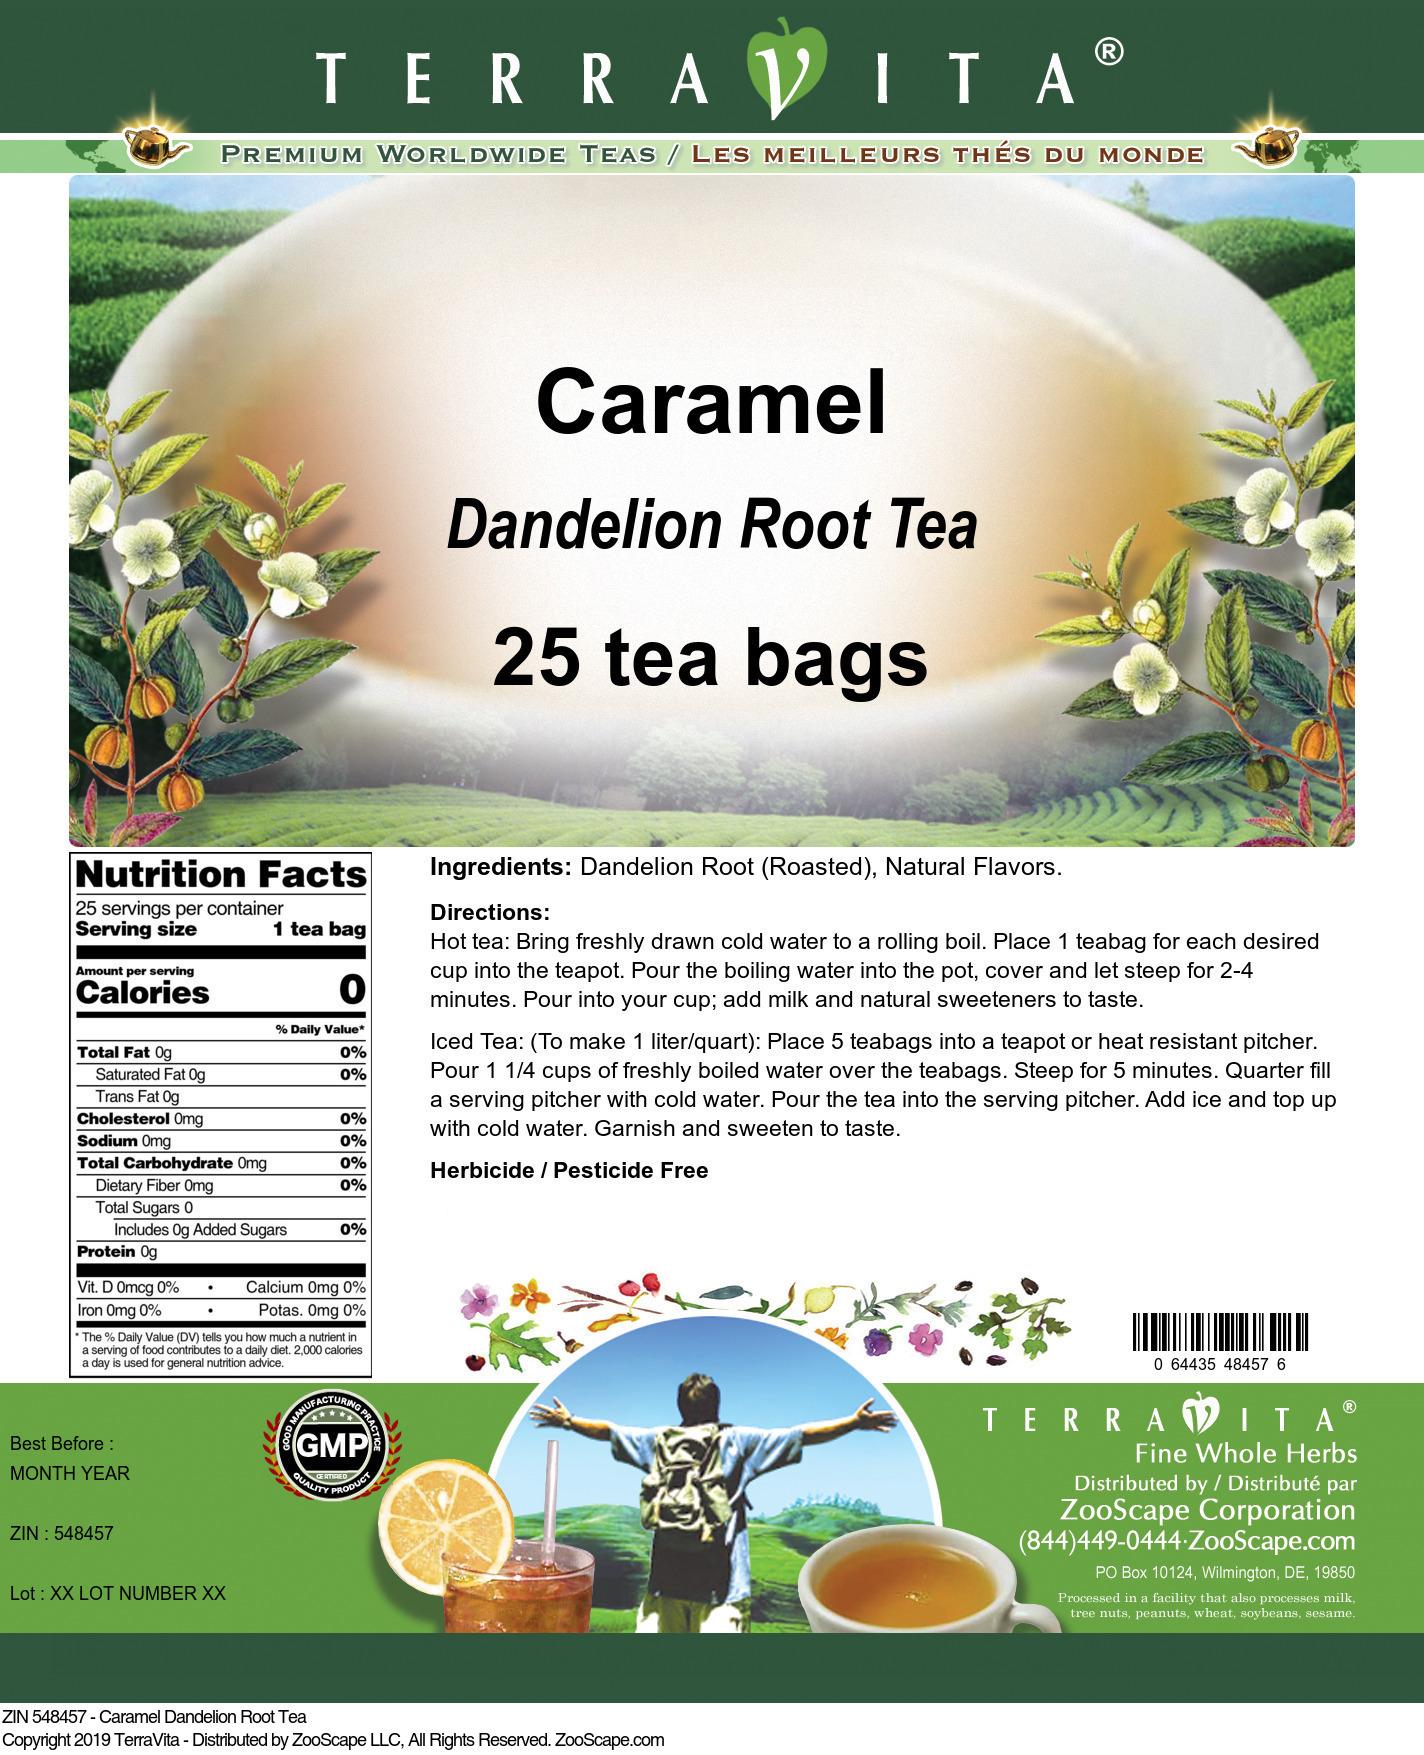 Caramel Dandelion Root